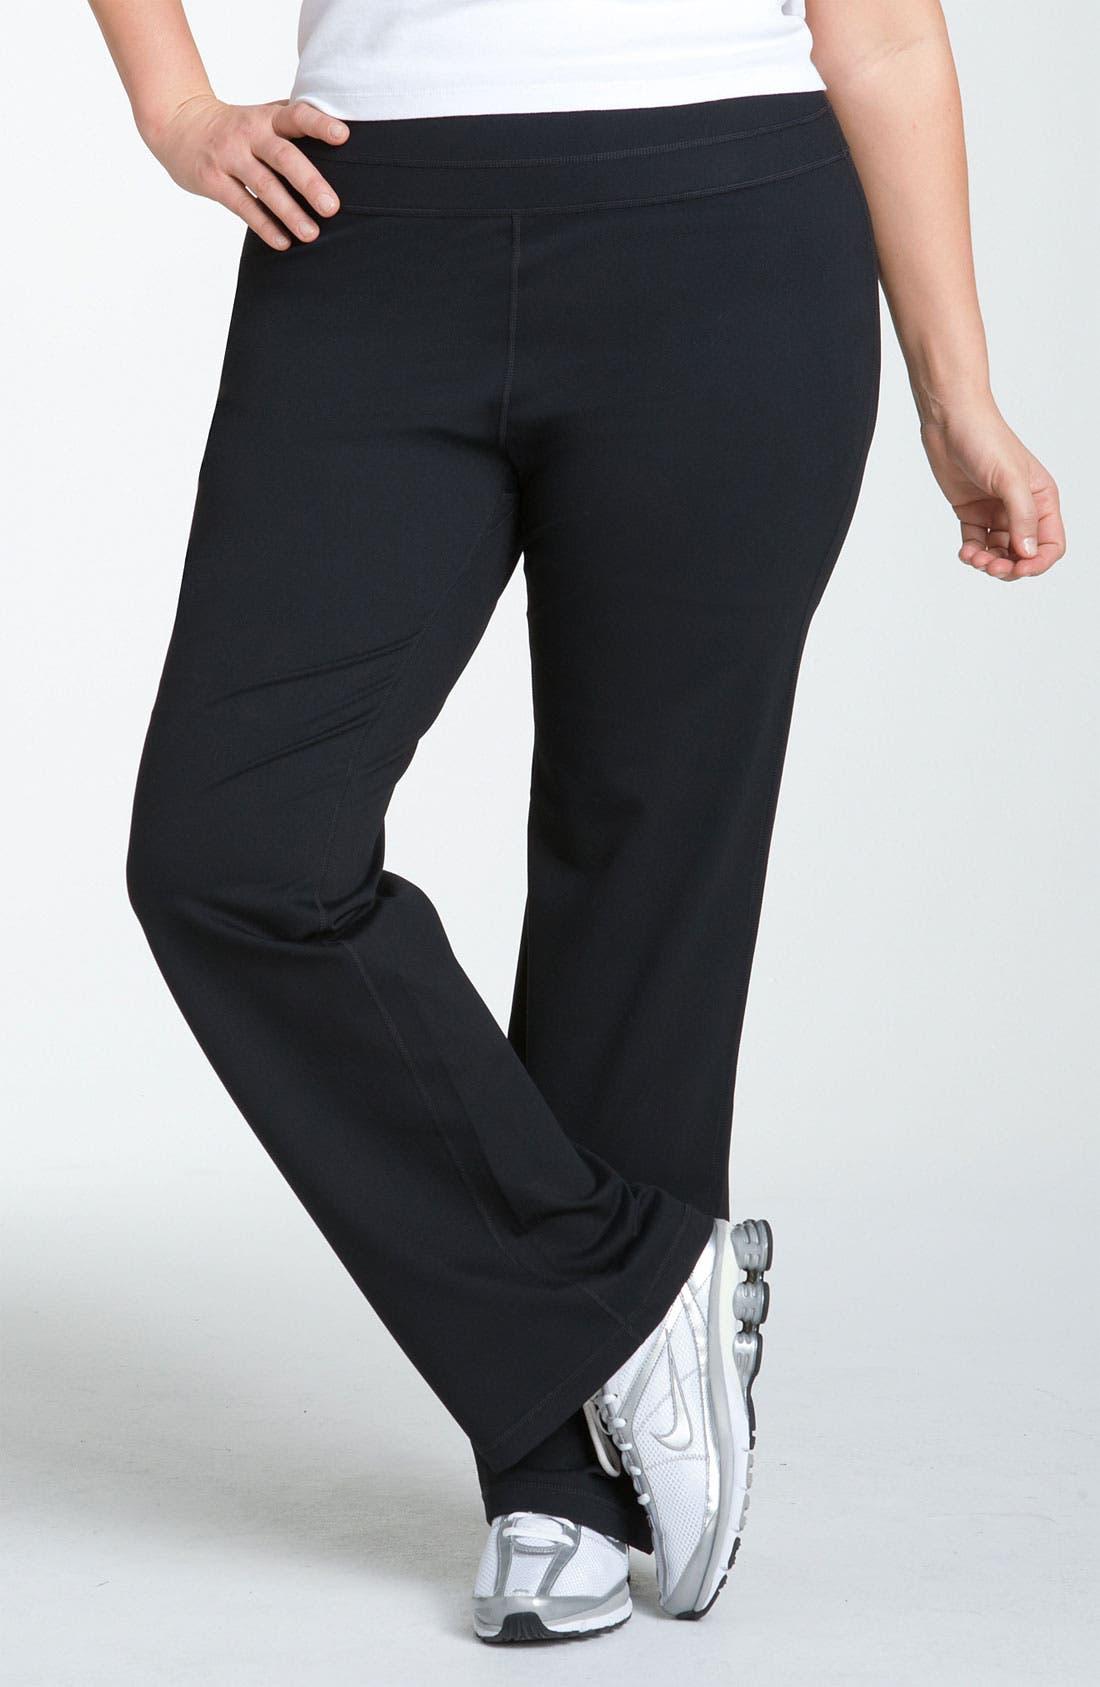 Main Image - Zella 'Booty' Reversible Pants (Plus Size)